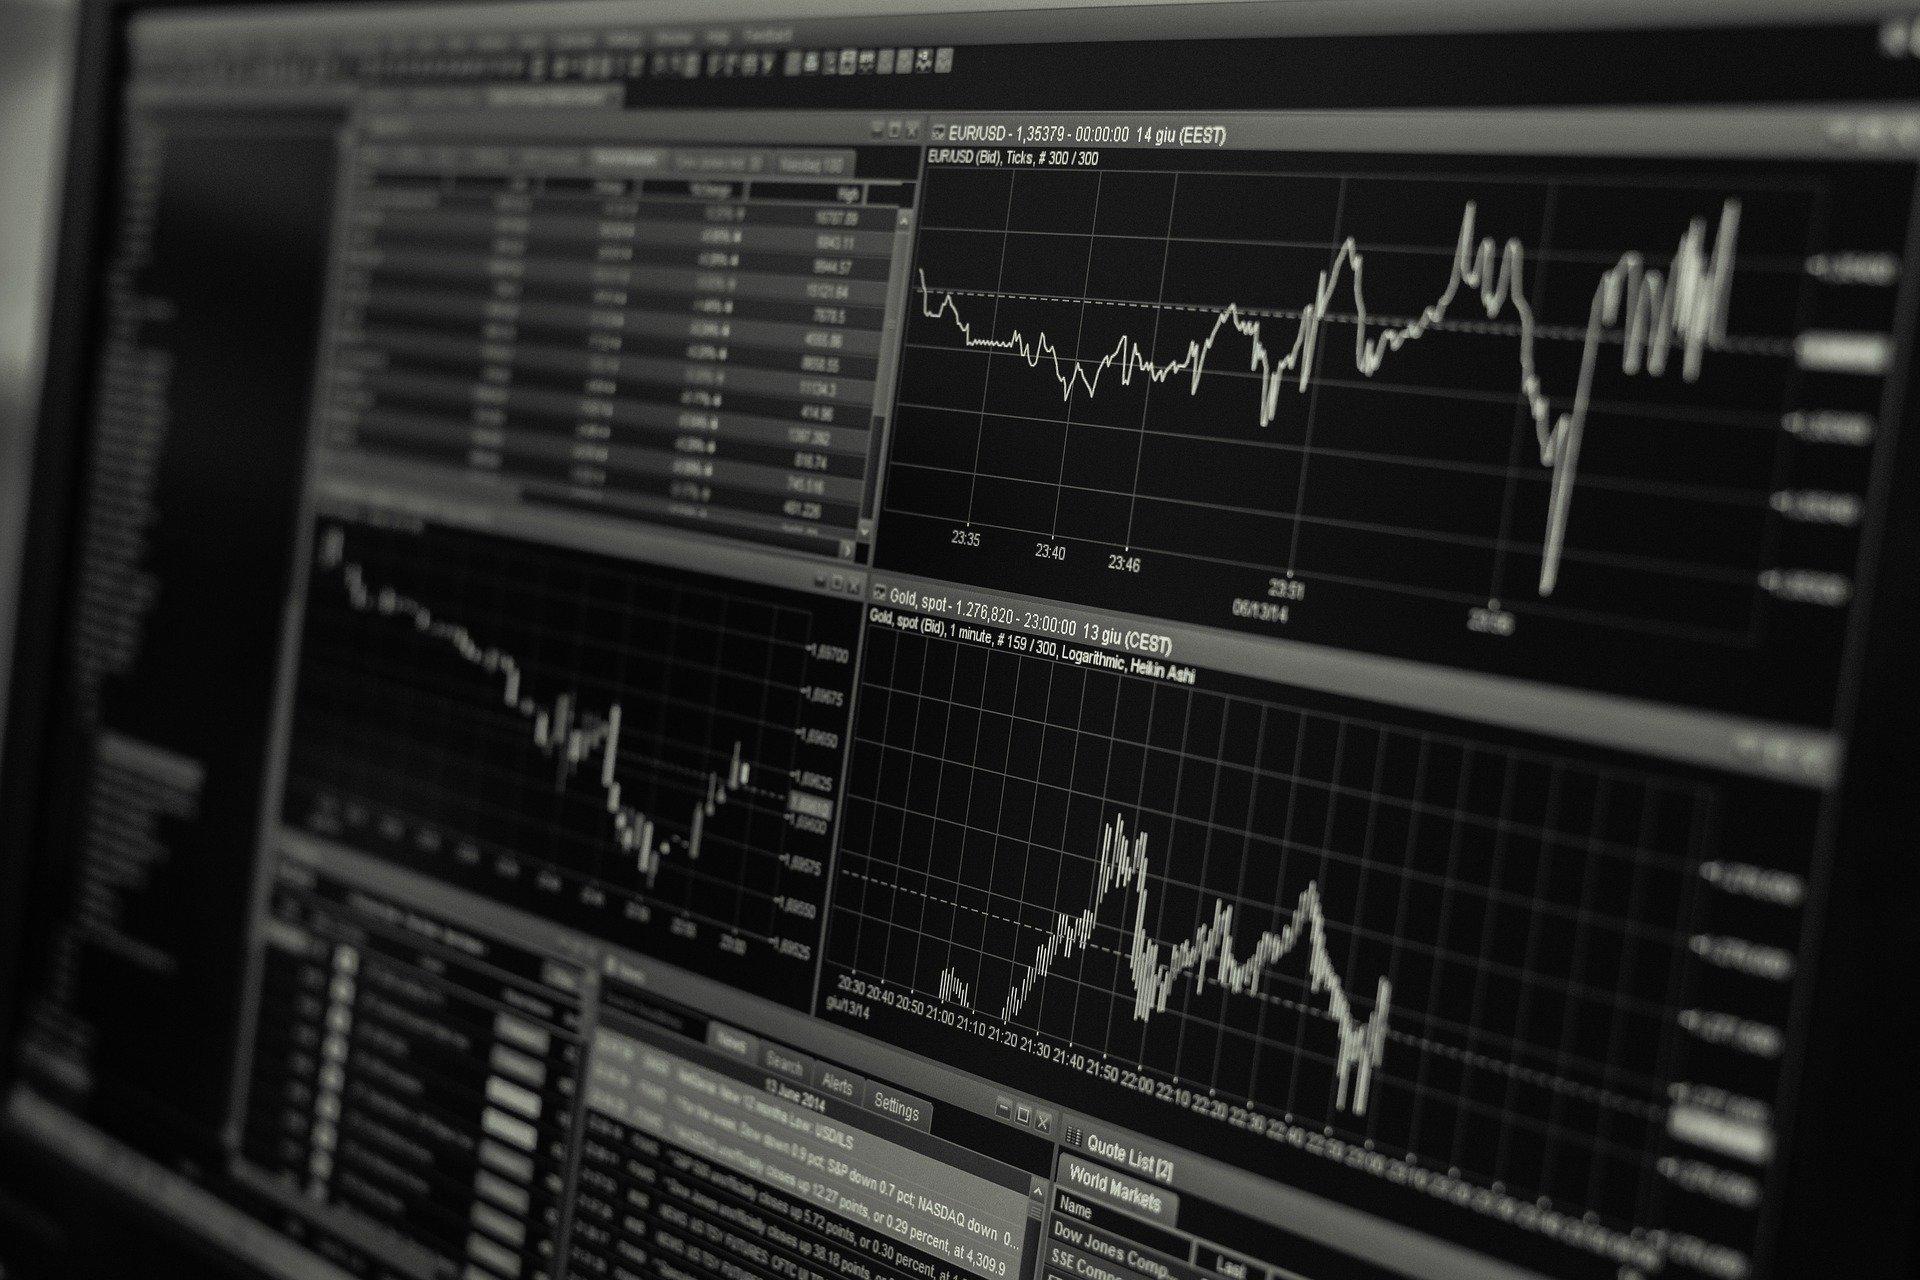 Joseph W. Brady on Supply Chain of Goods and Economic News